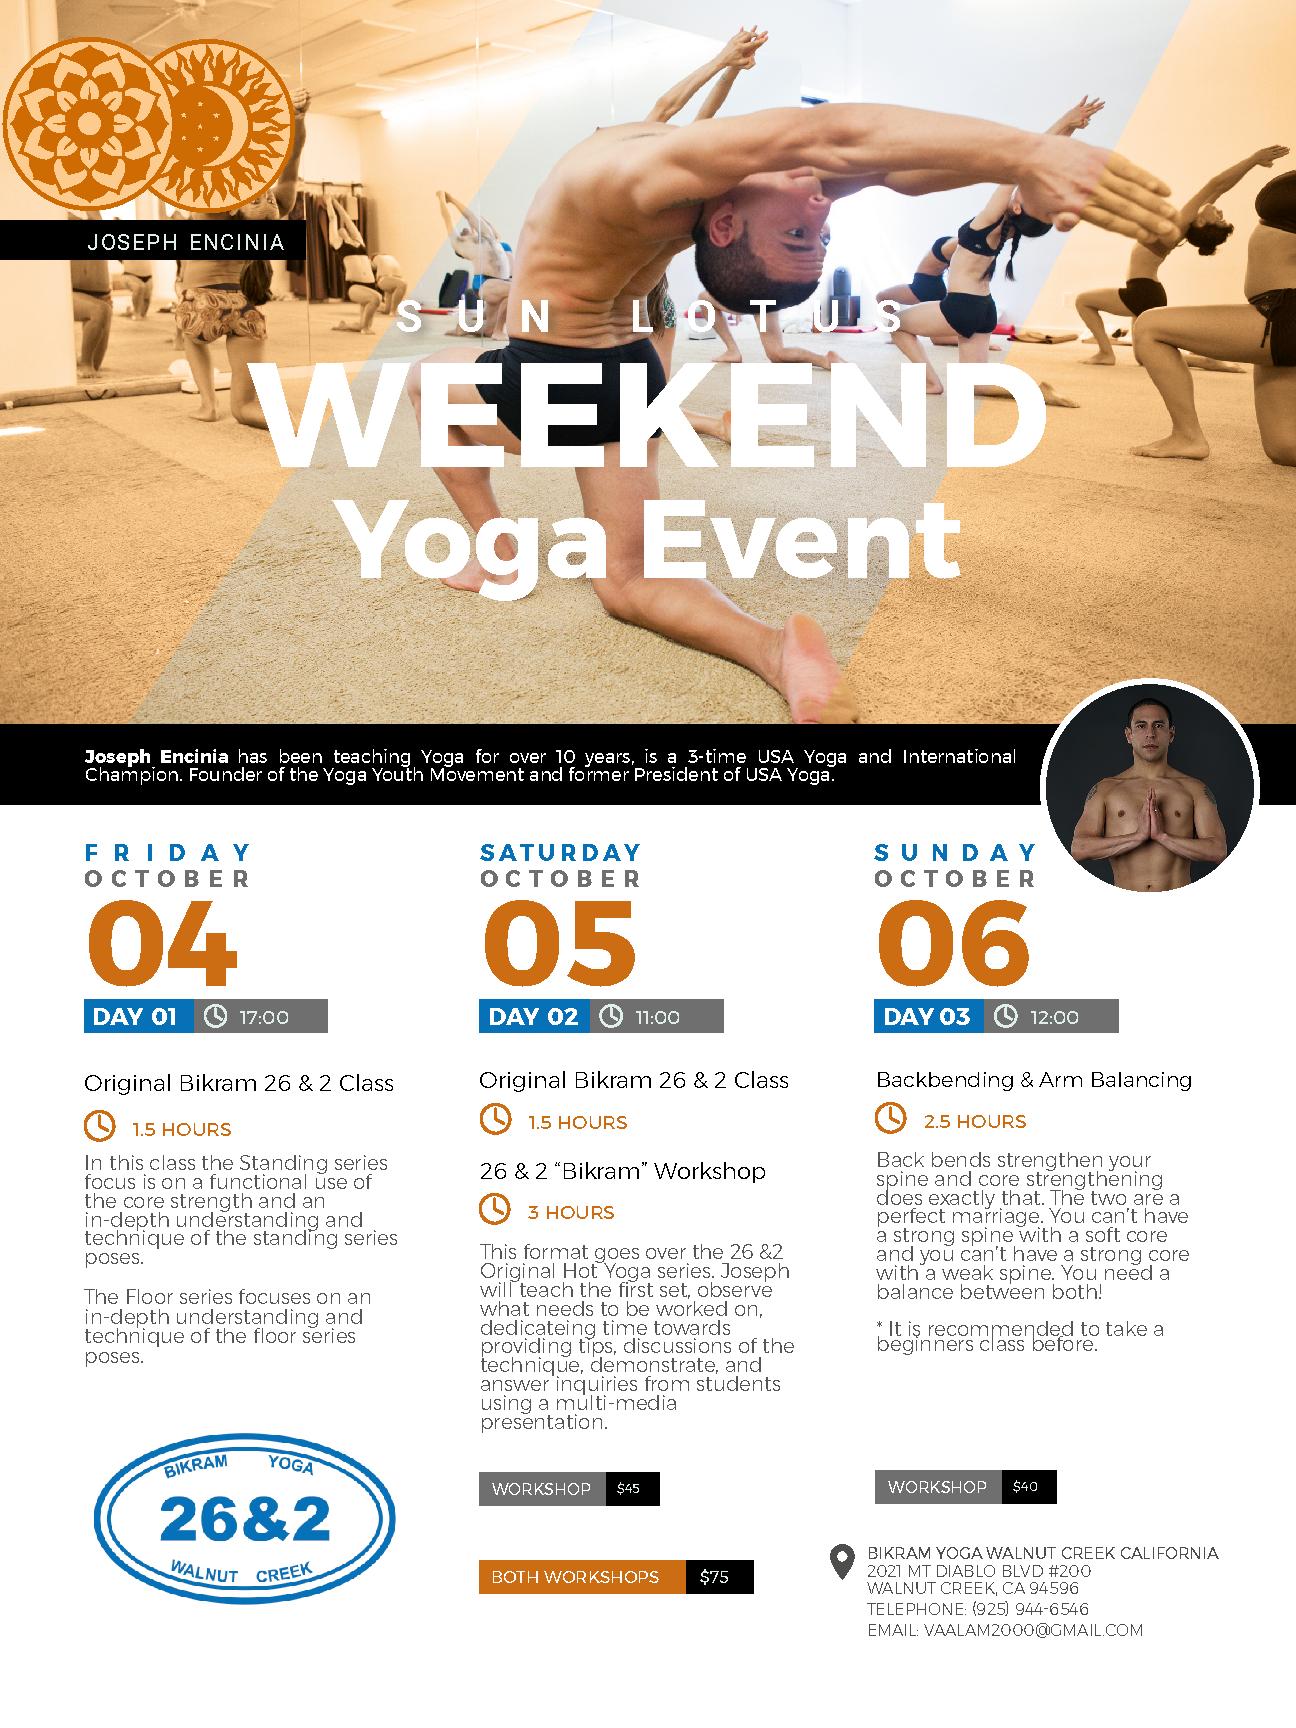 Walnut Creek, California | October 4-6, 2019 | Beginners Yoga Work Shop & Back Bending and Arm Balancing Workshop